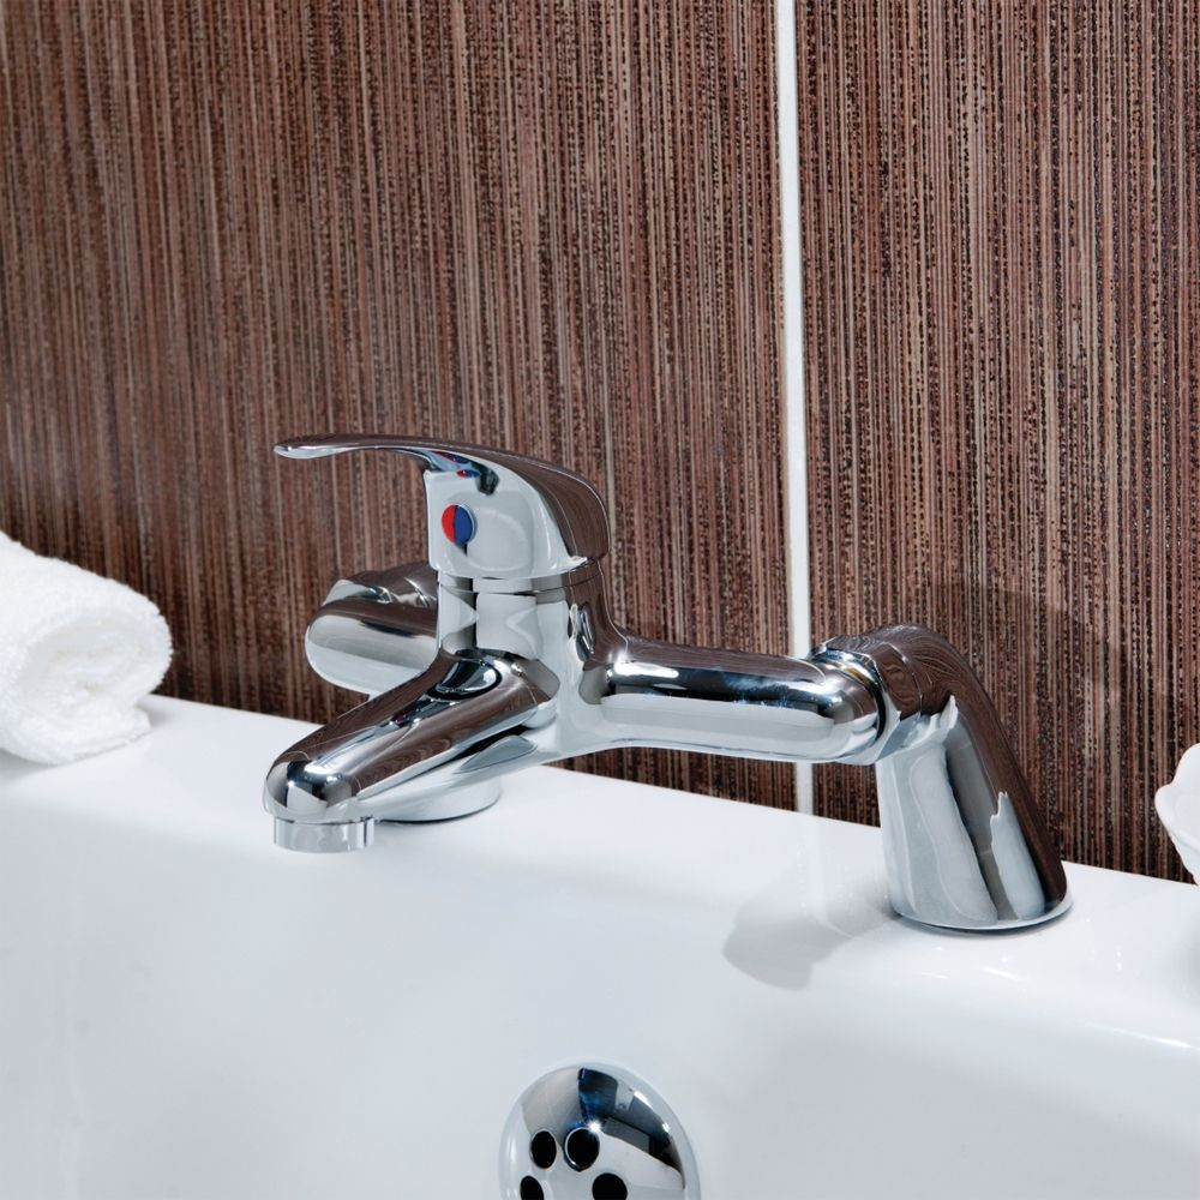 Zenith Rio Bath Filler Tap Lifestyle